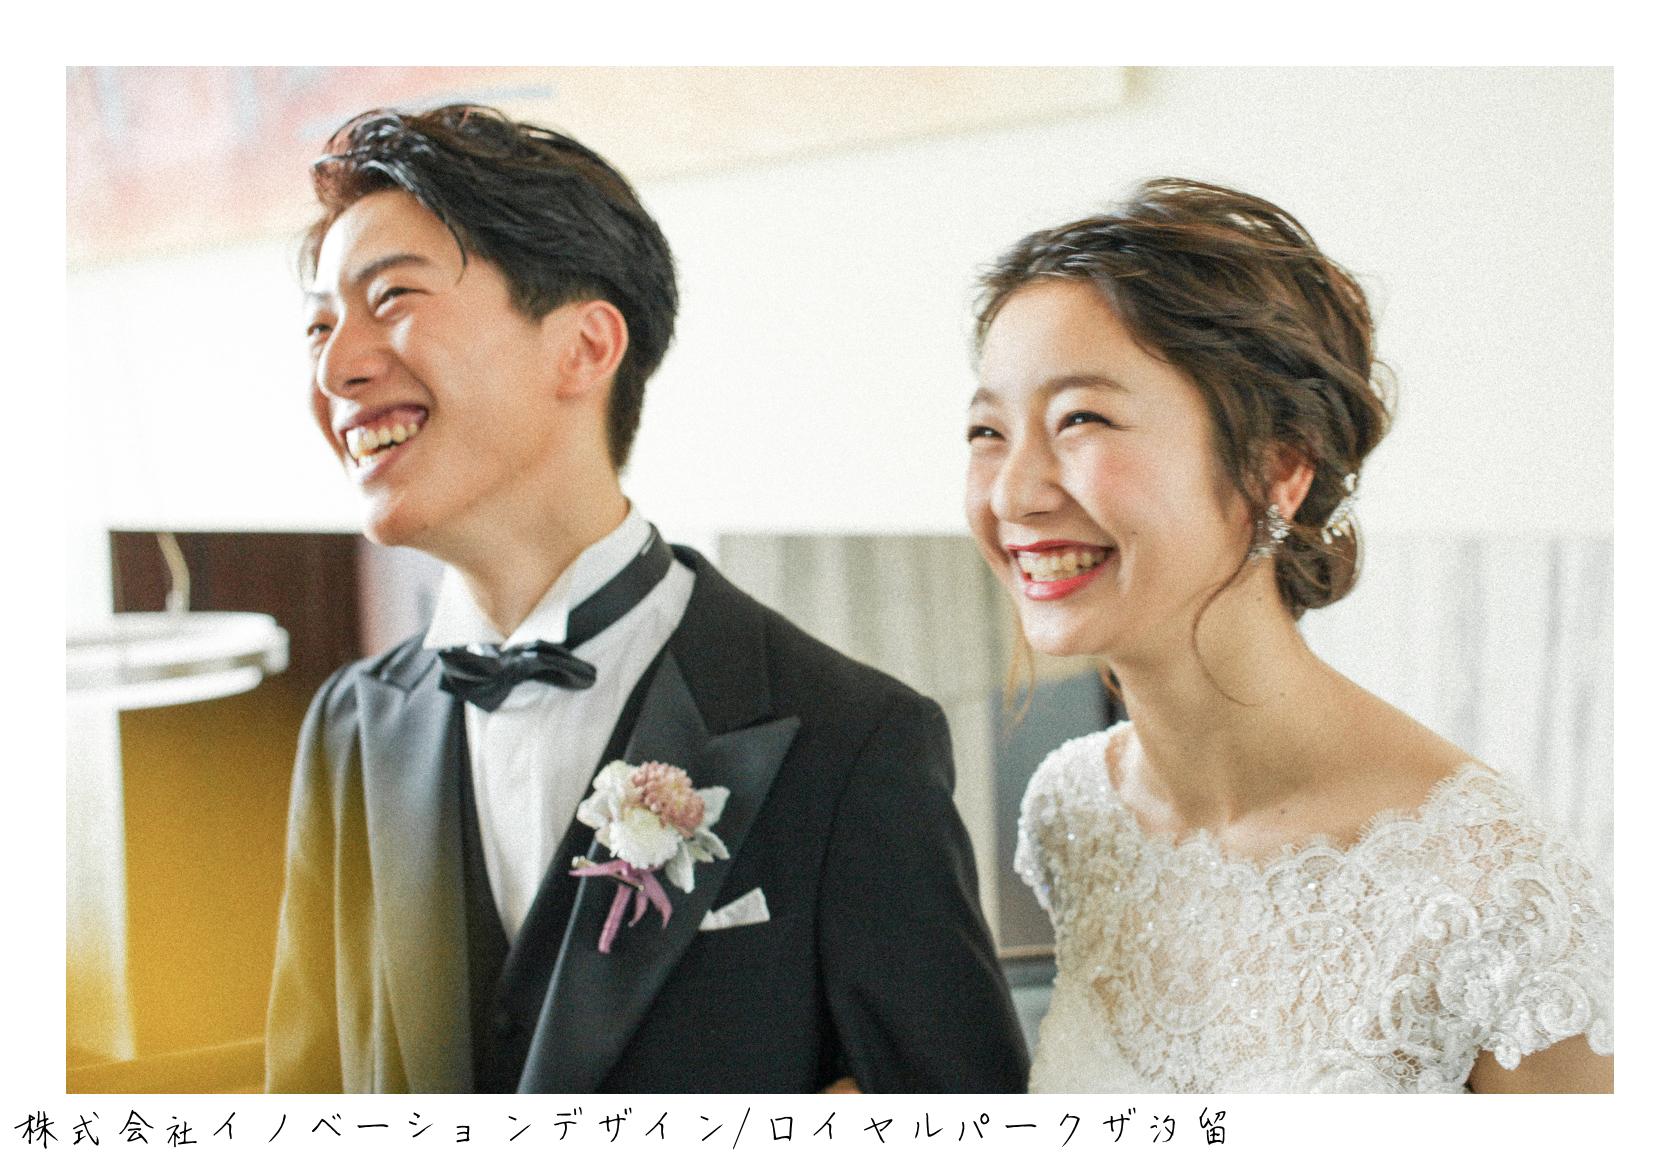 【works】株式会社イノベーションデザイン/ロイヤルパークホテルザ汐留